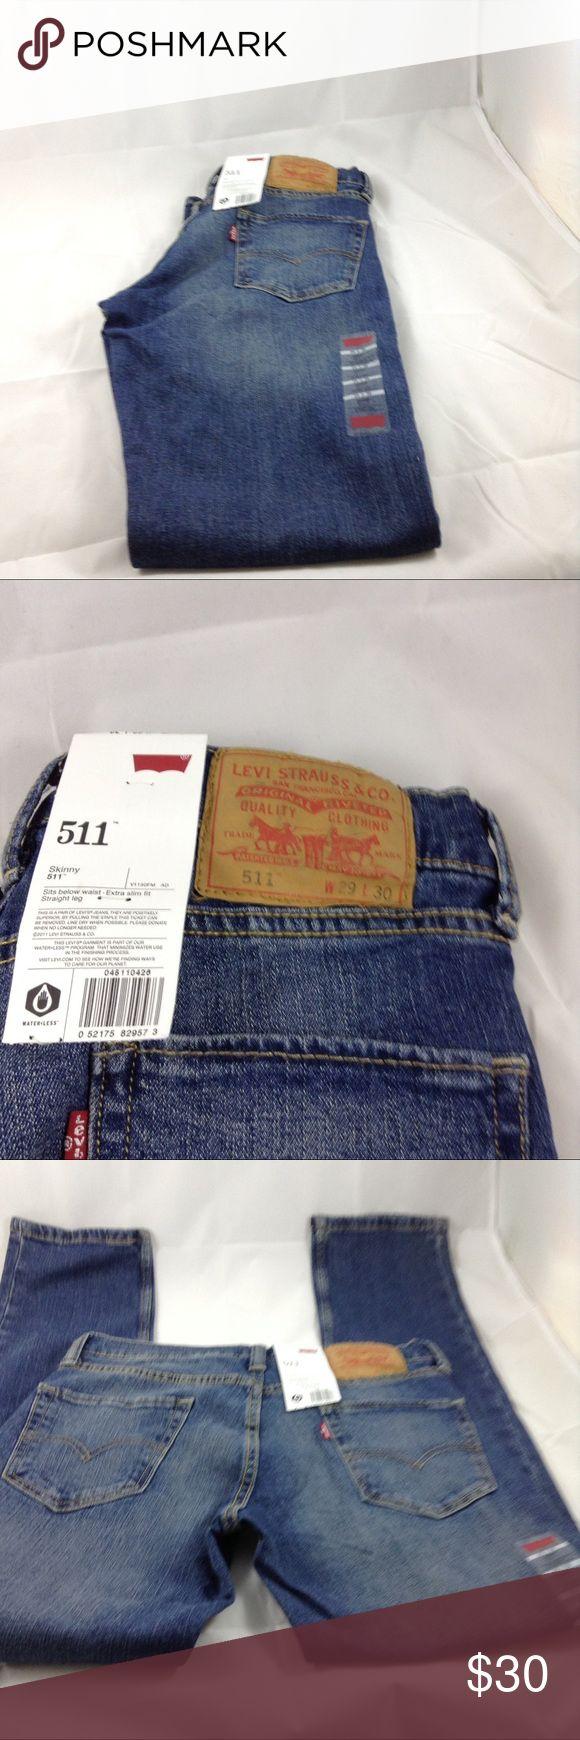 Levi jeans 511 Levi's 511 waist 29 Length 30 Levi's Jeans Skinny